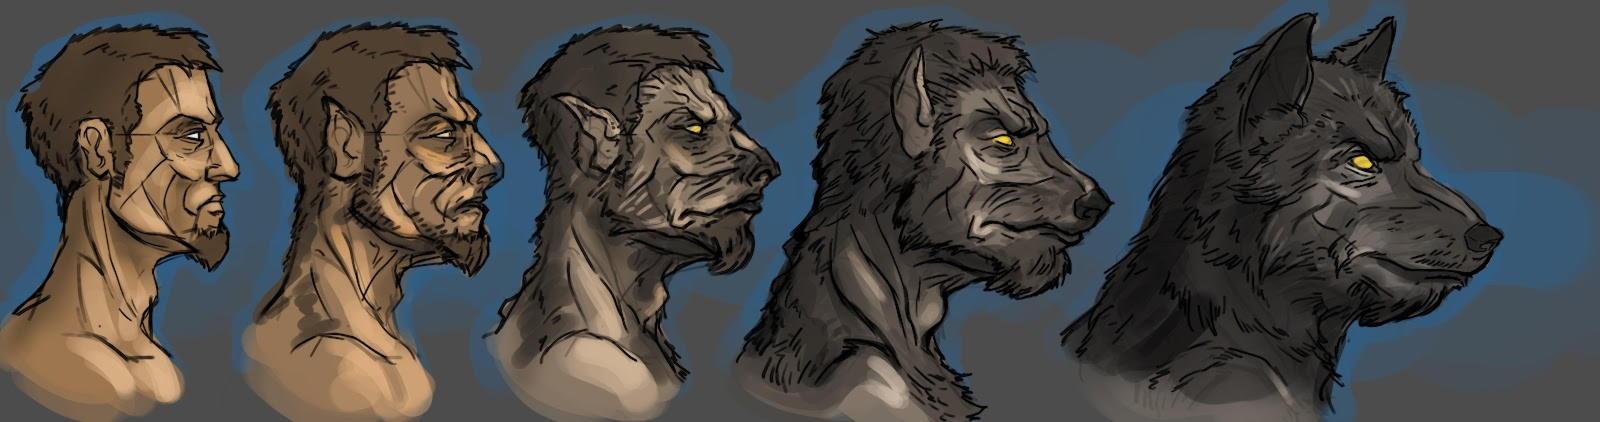 werewolf_transformation_by_tulwarr1-d3kwasc